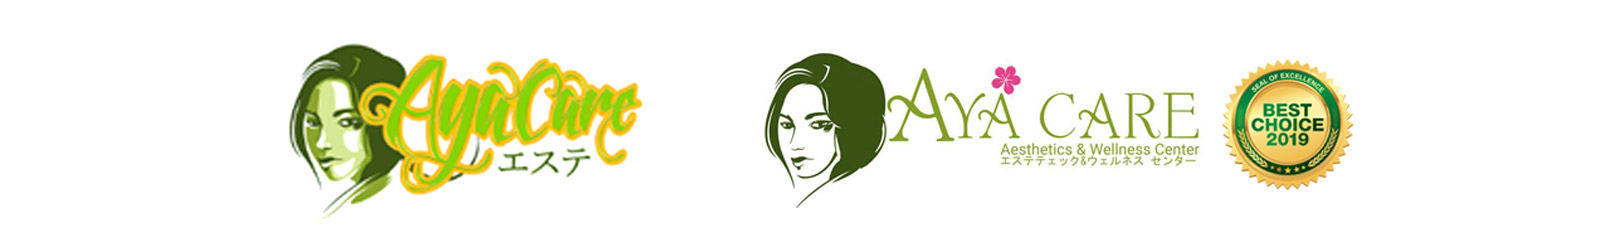 Aya Careエステ